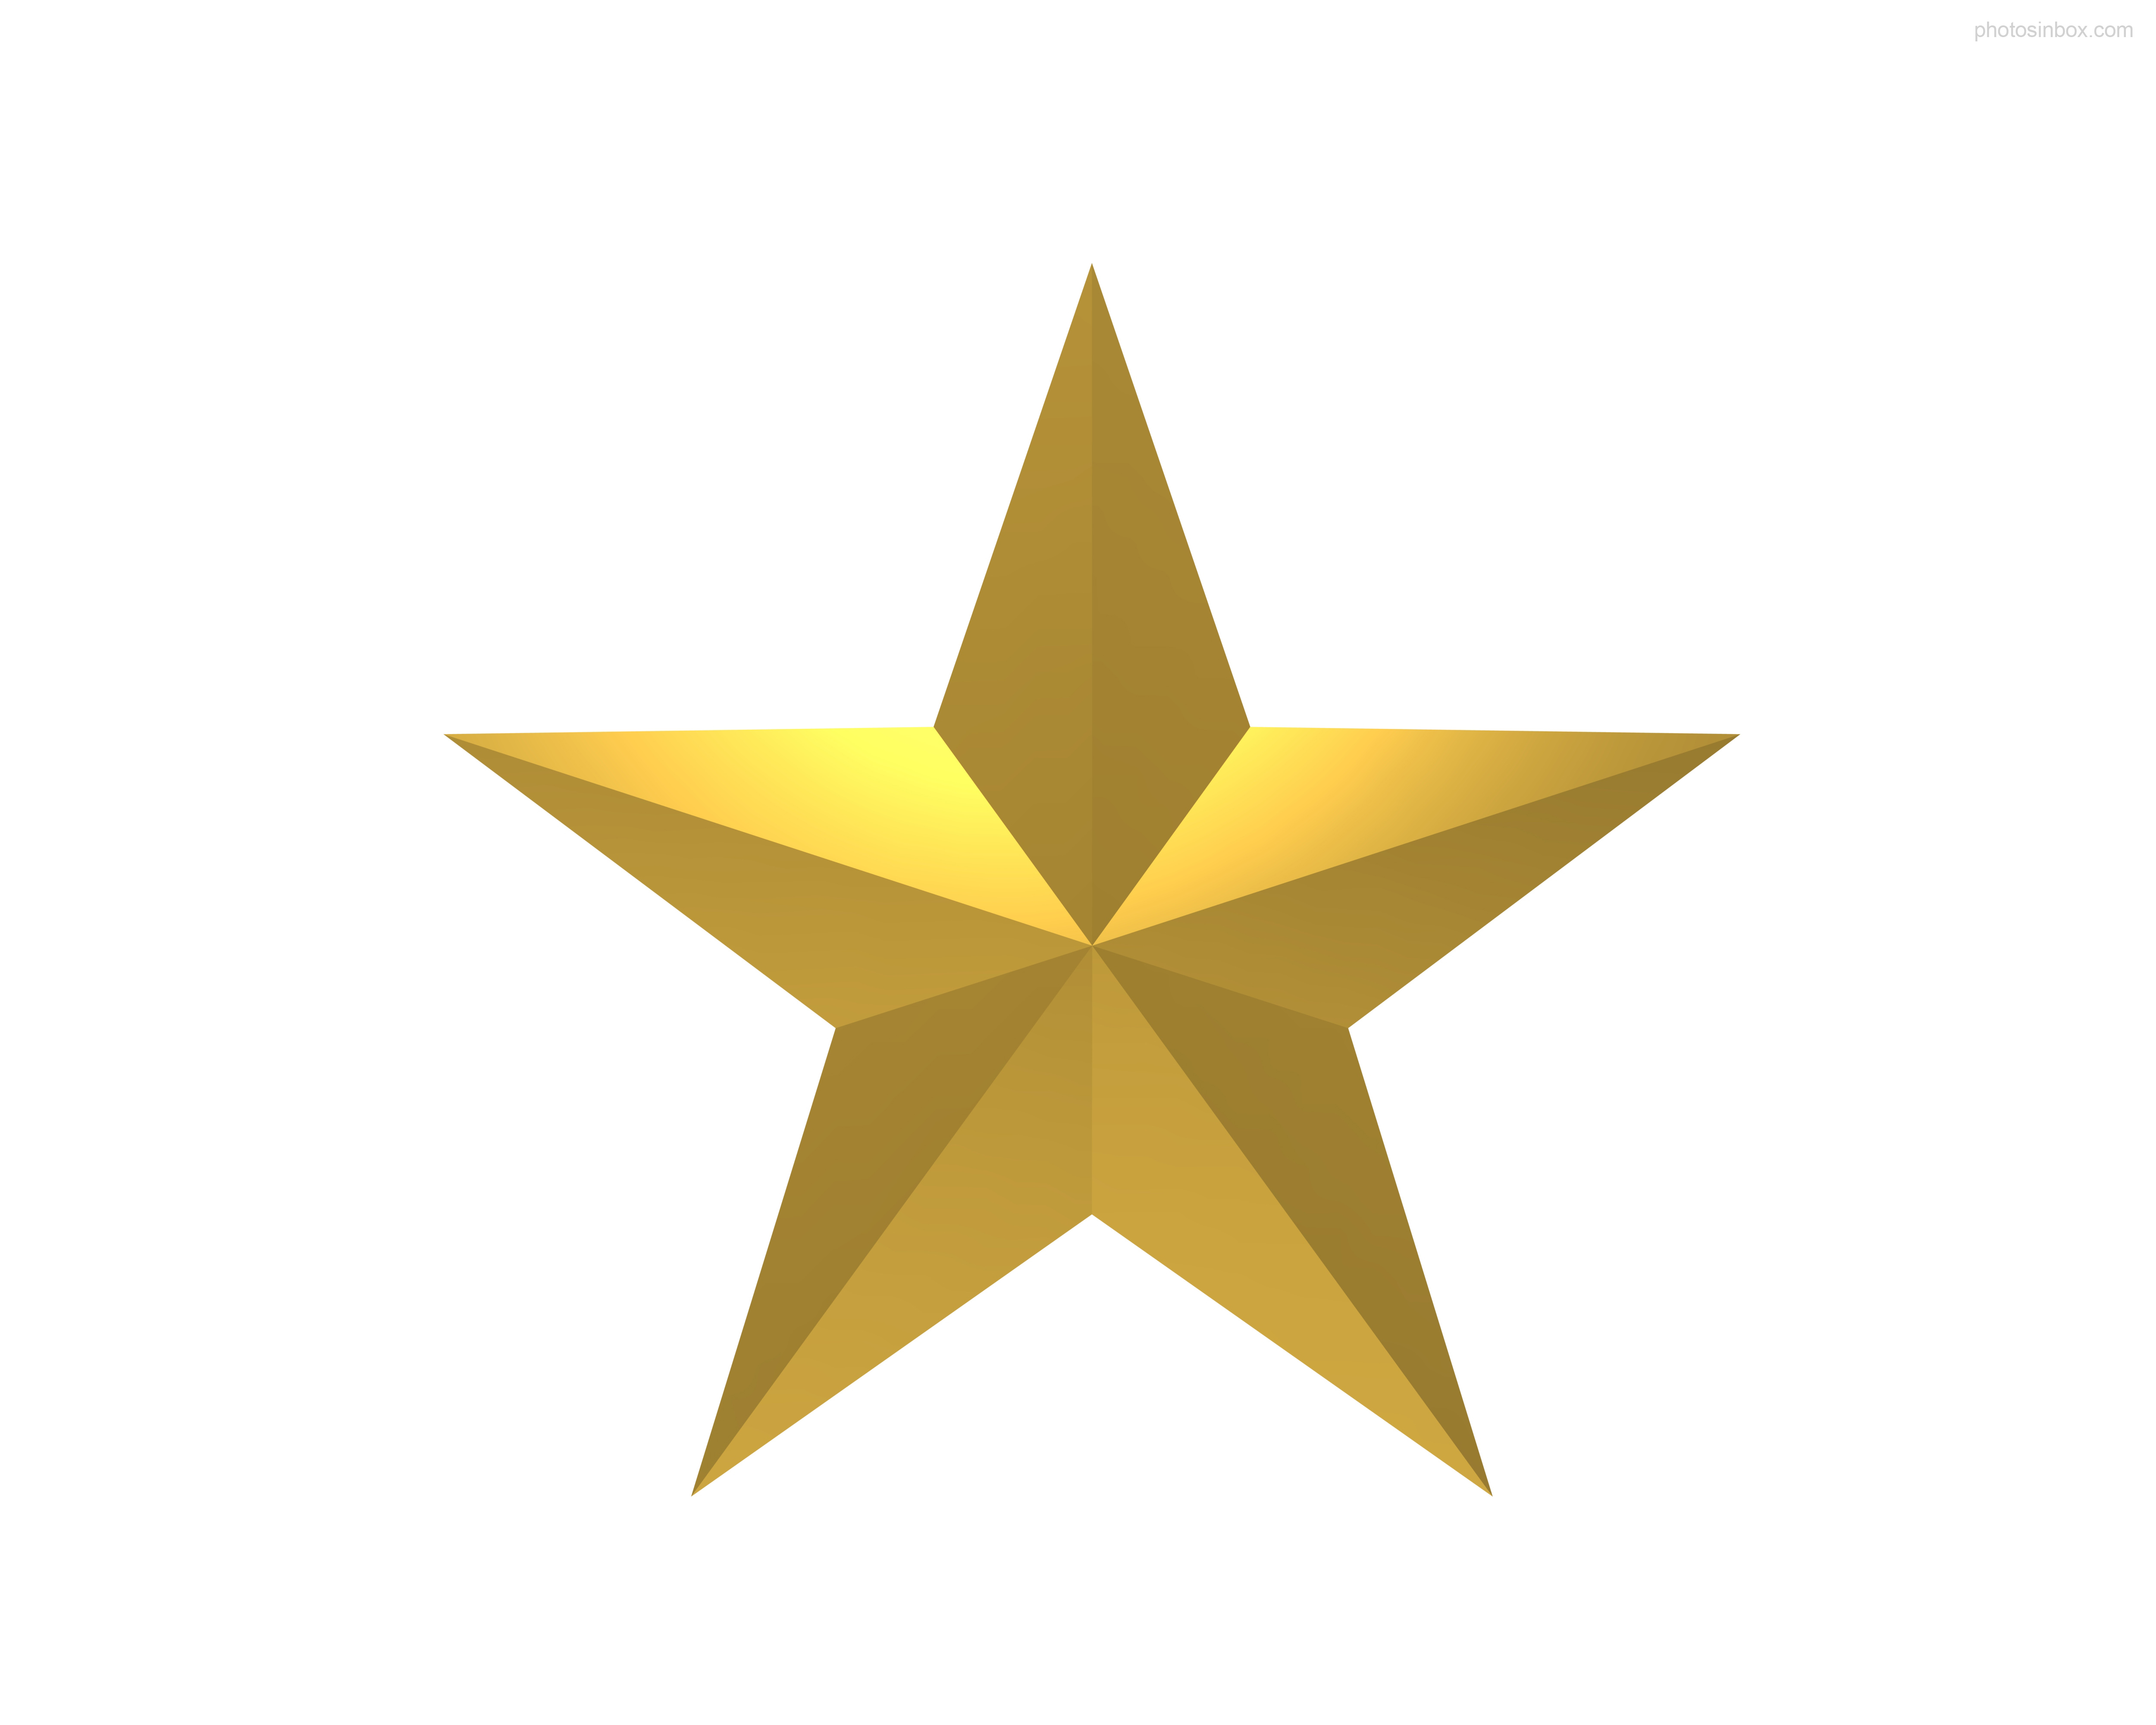 5000x4000 Gold Star Images Clip Art